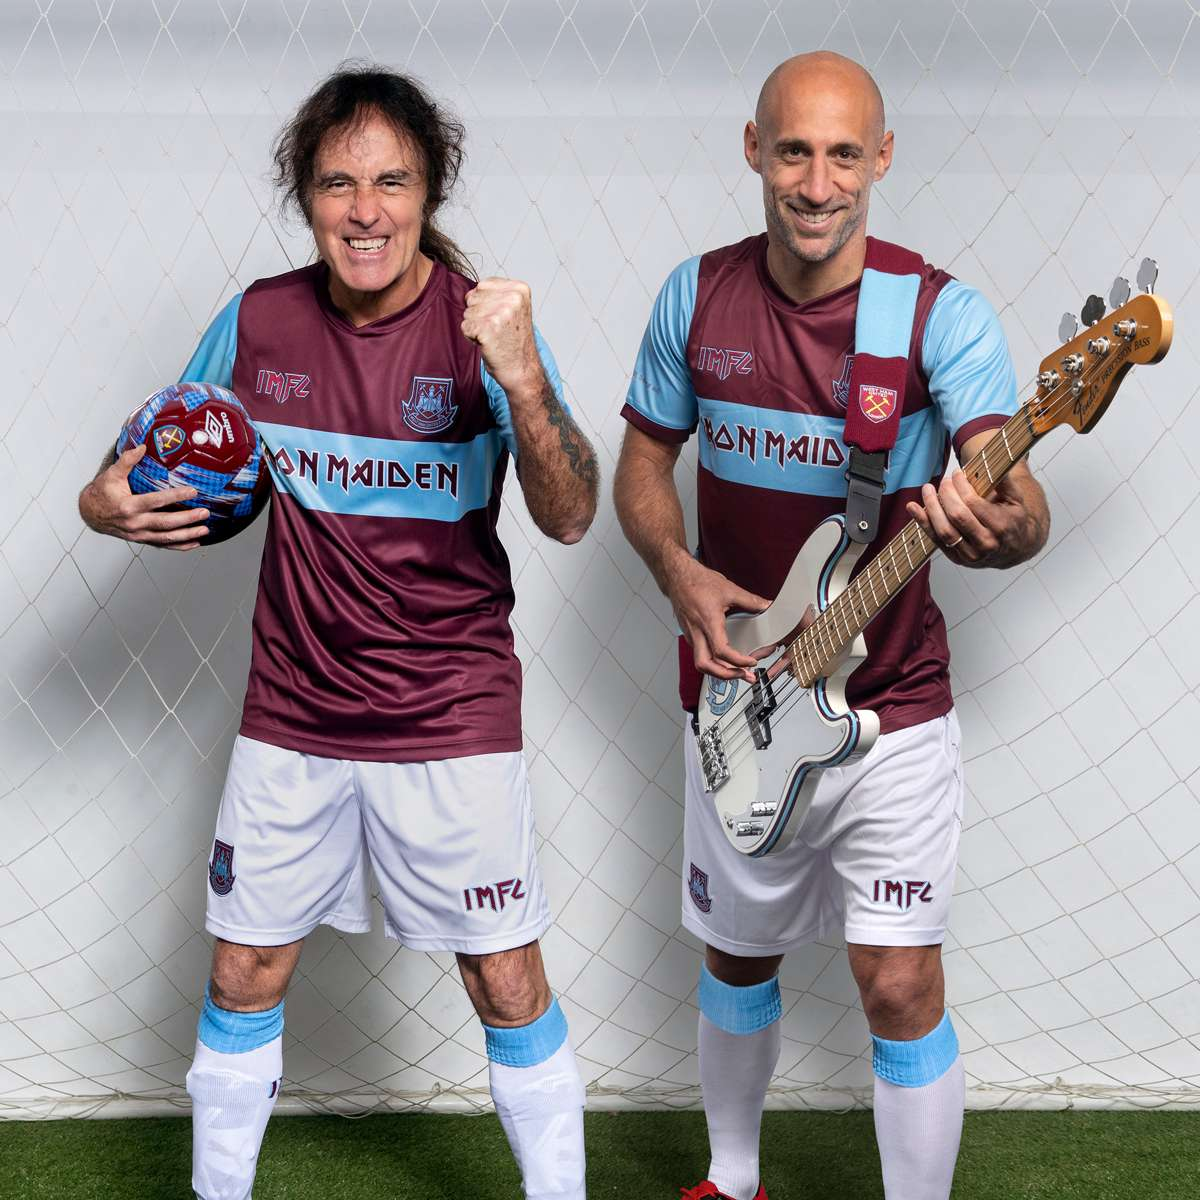 iron-maiden-x-west-ham-football-shorts.jpg